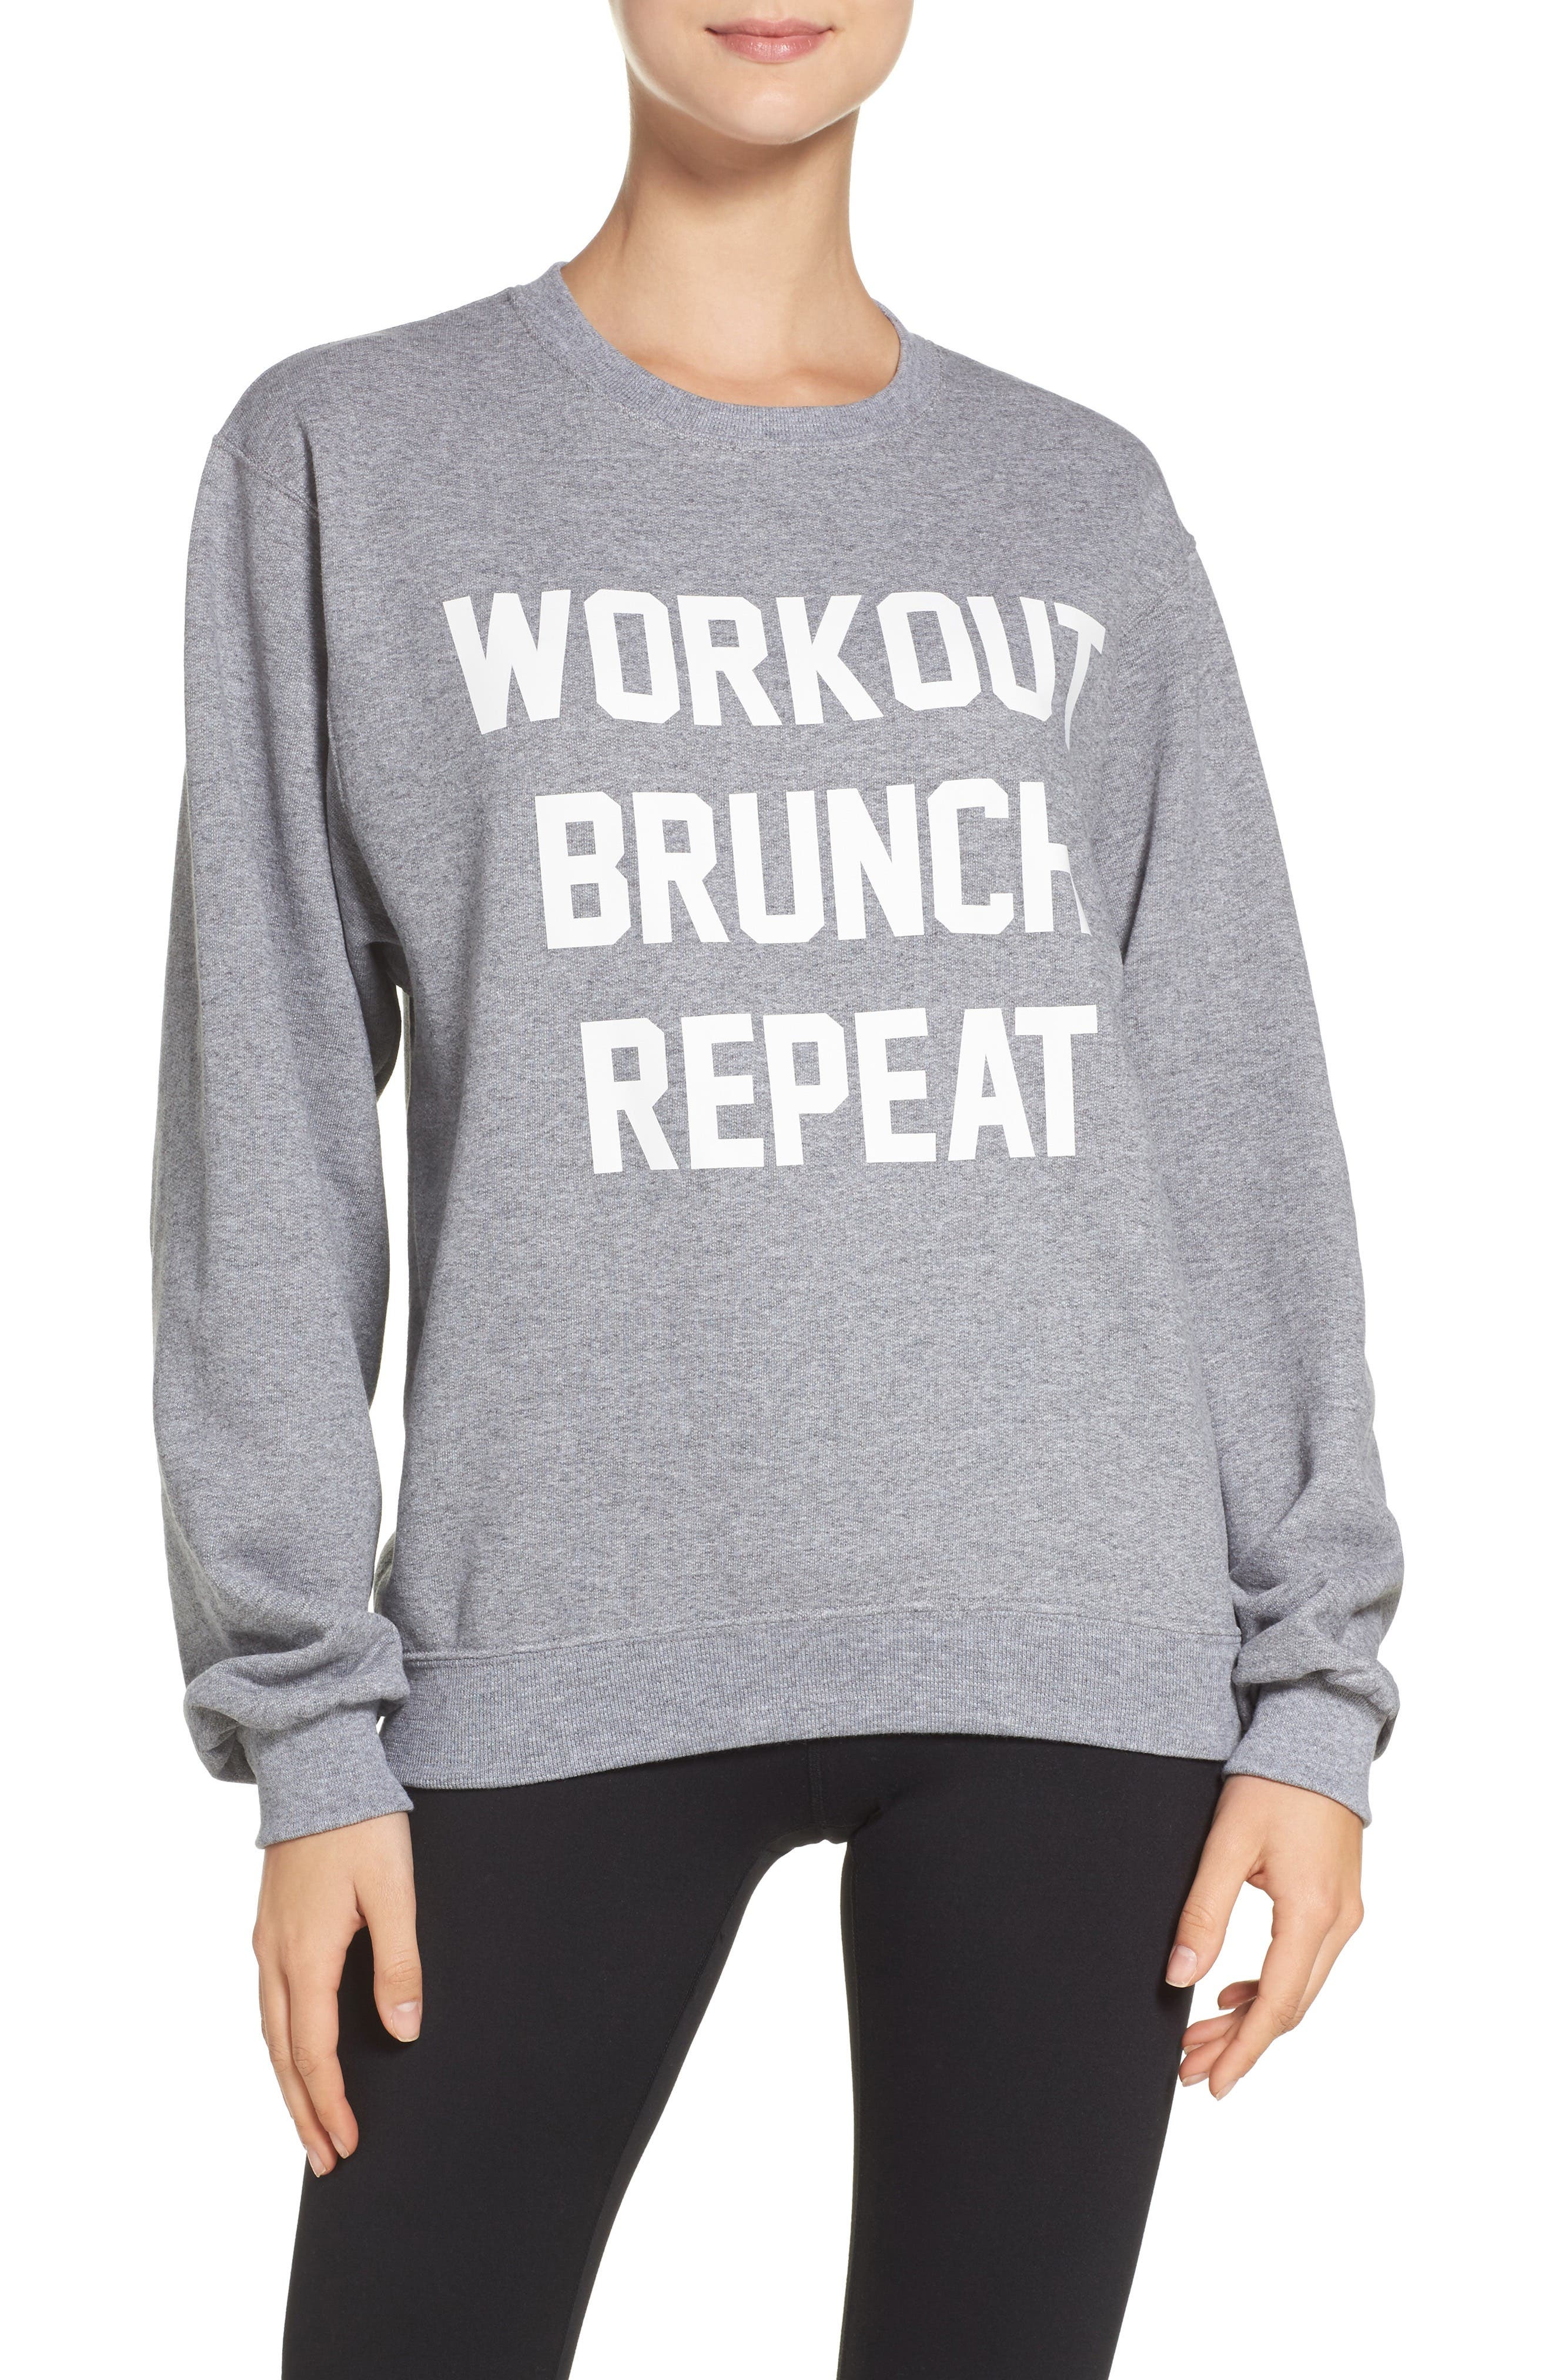 Workout Brunch Repeat Sweatshirt,                         Main,                         color, Grey